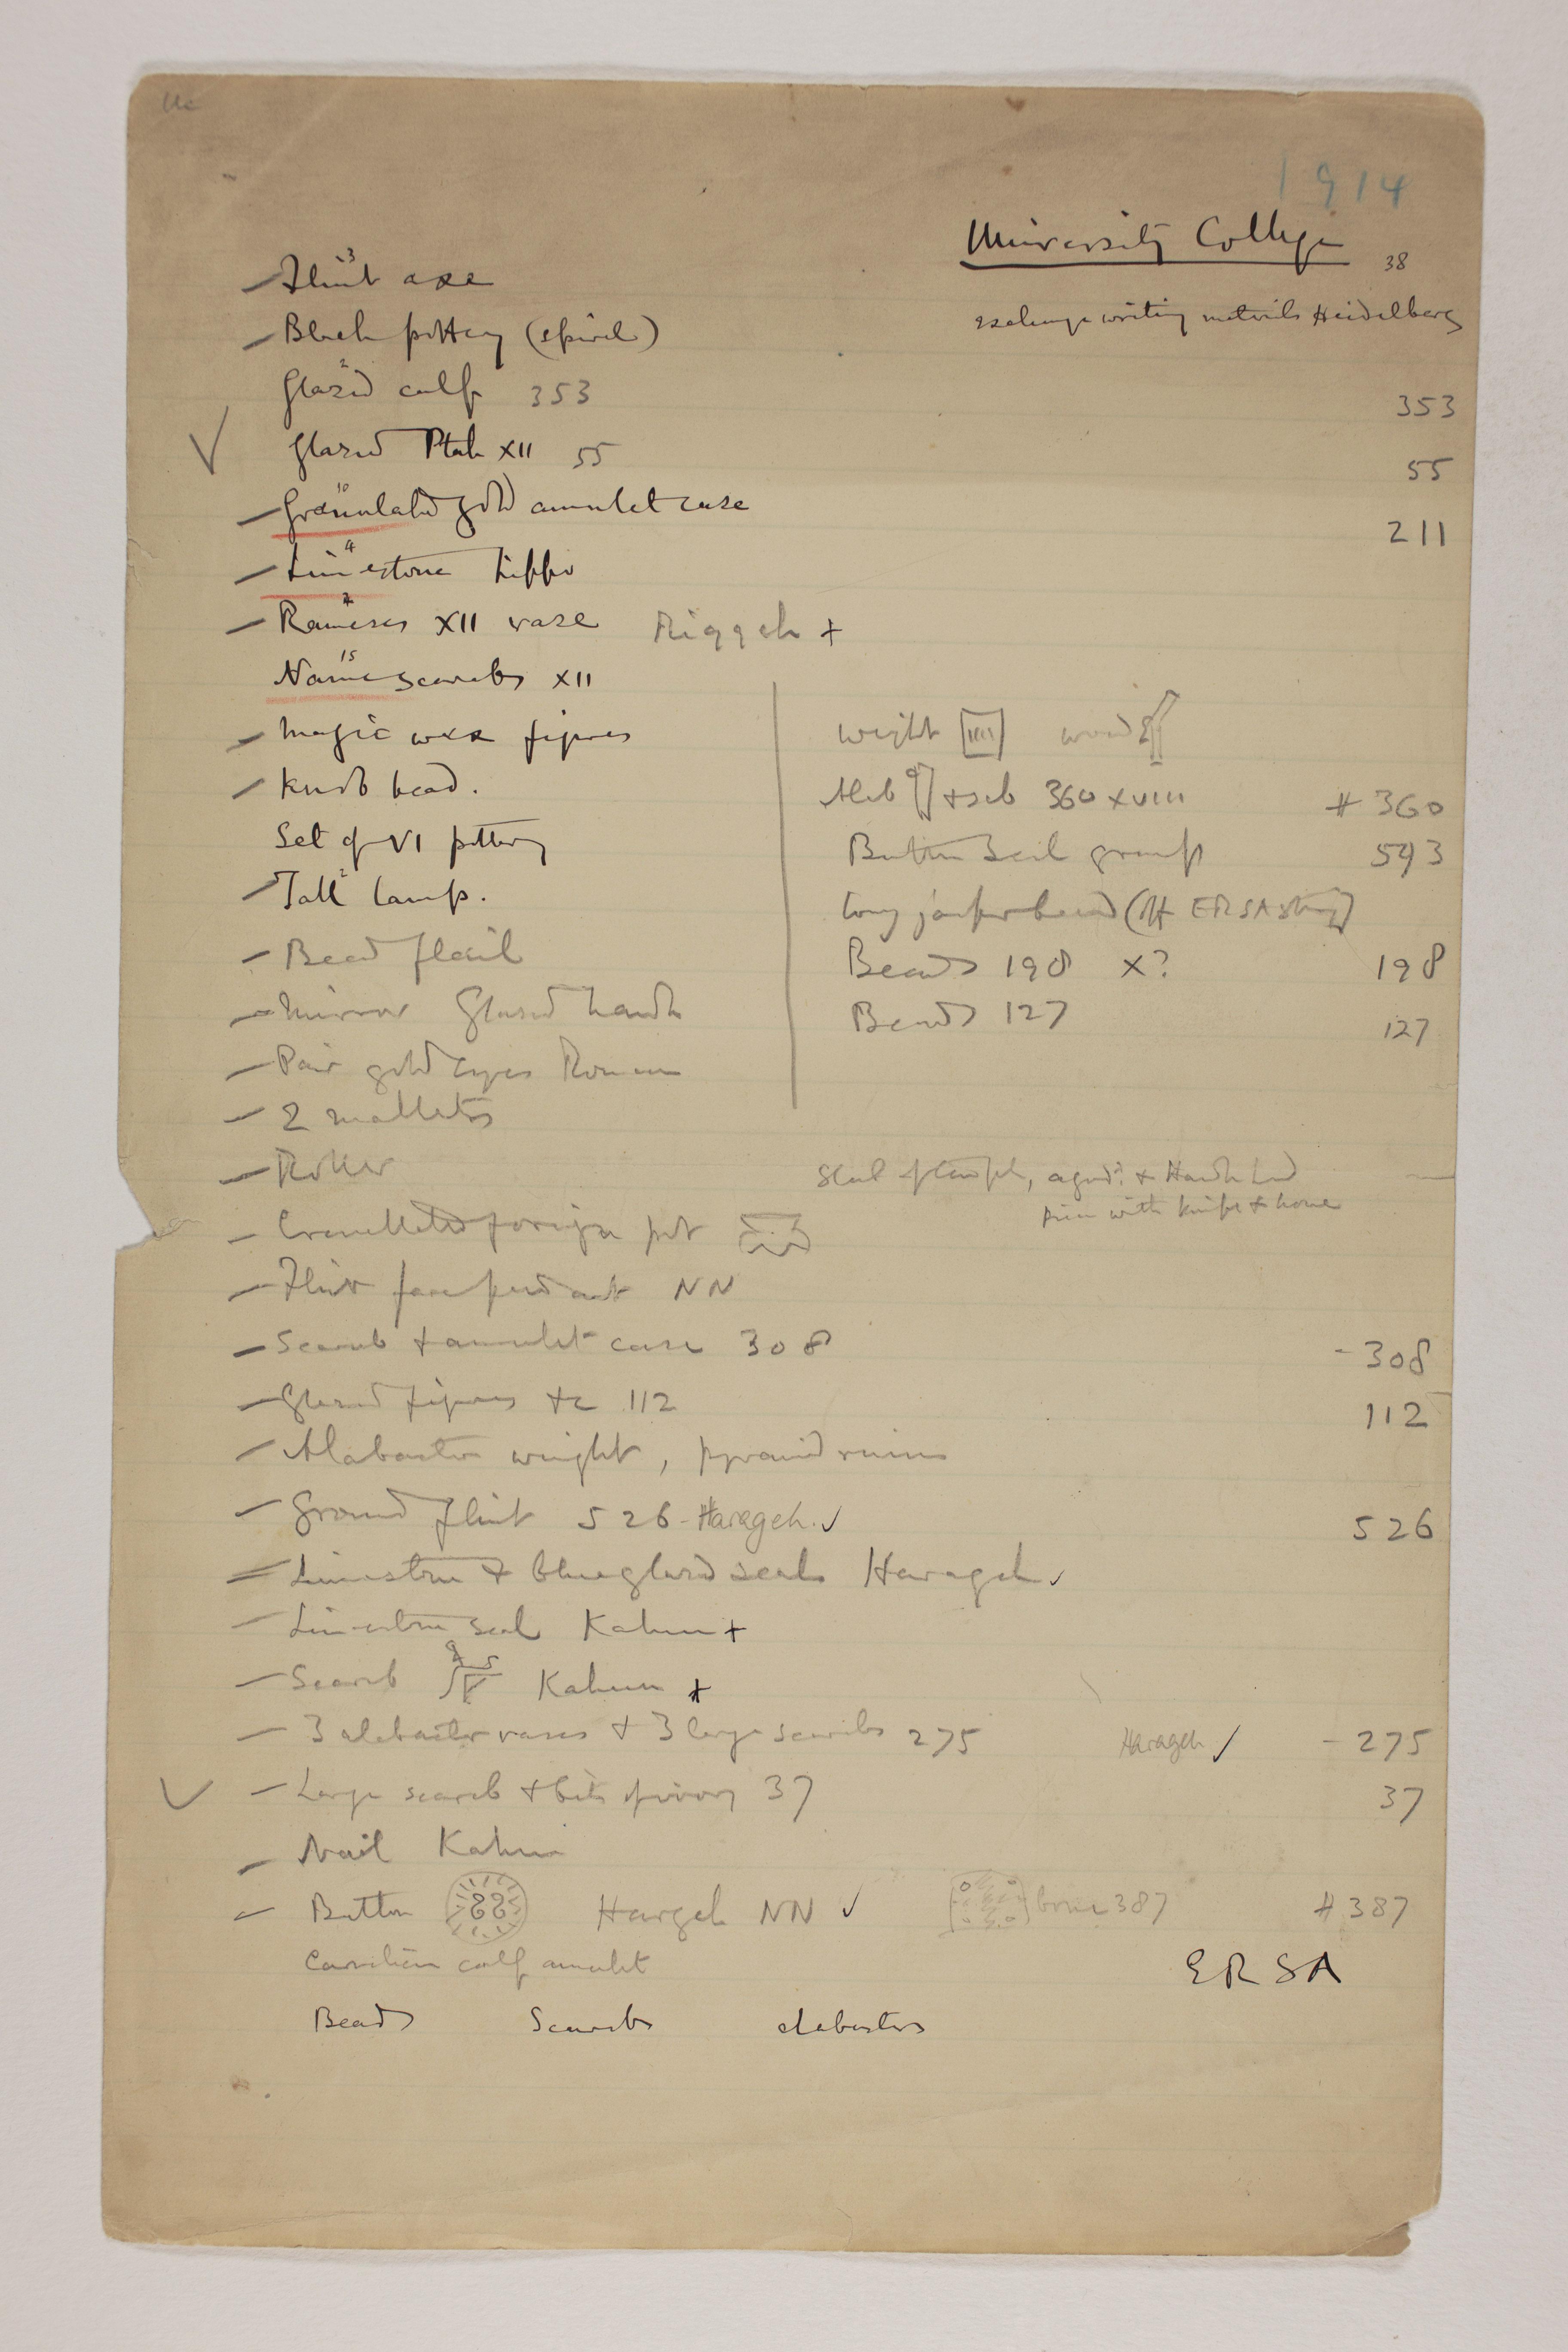 1913-14 Lahun, Haraga Individual institution list  PMA/WFP1/D/22/32